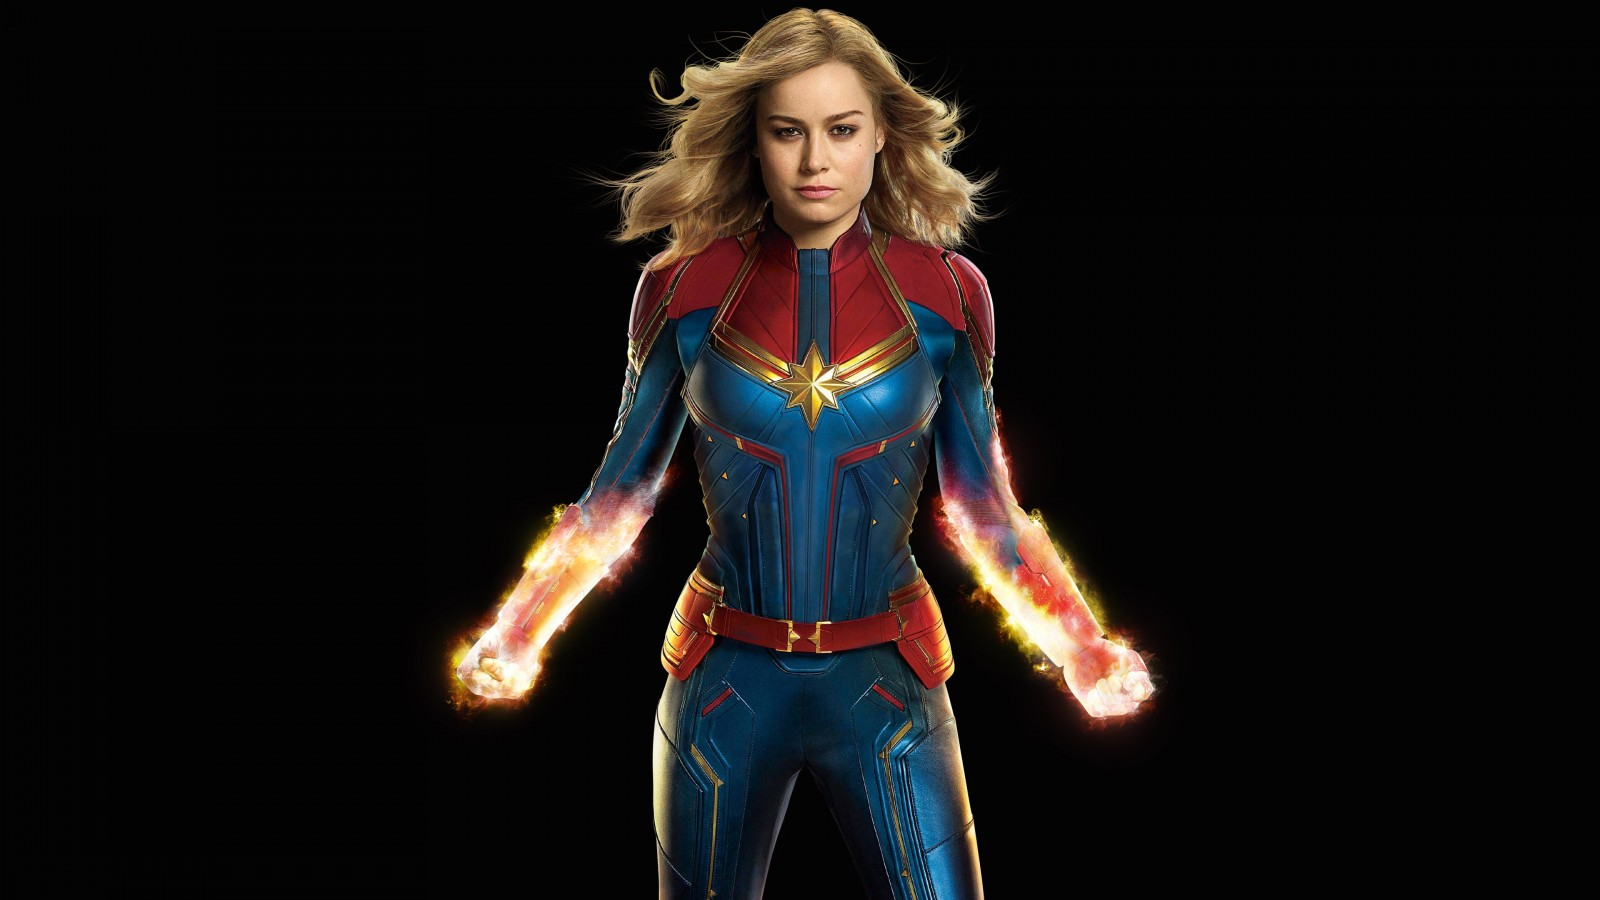 Marvel Iphone 7 Wallpaper Brie Larson As Captain Marvel 4k Wallpapers Hd